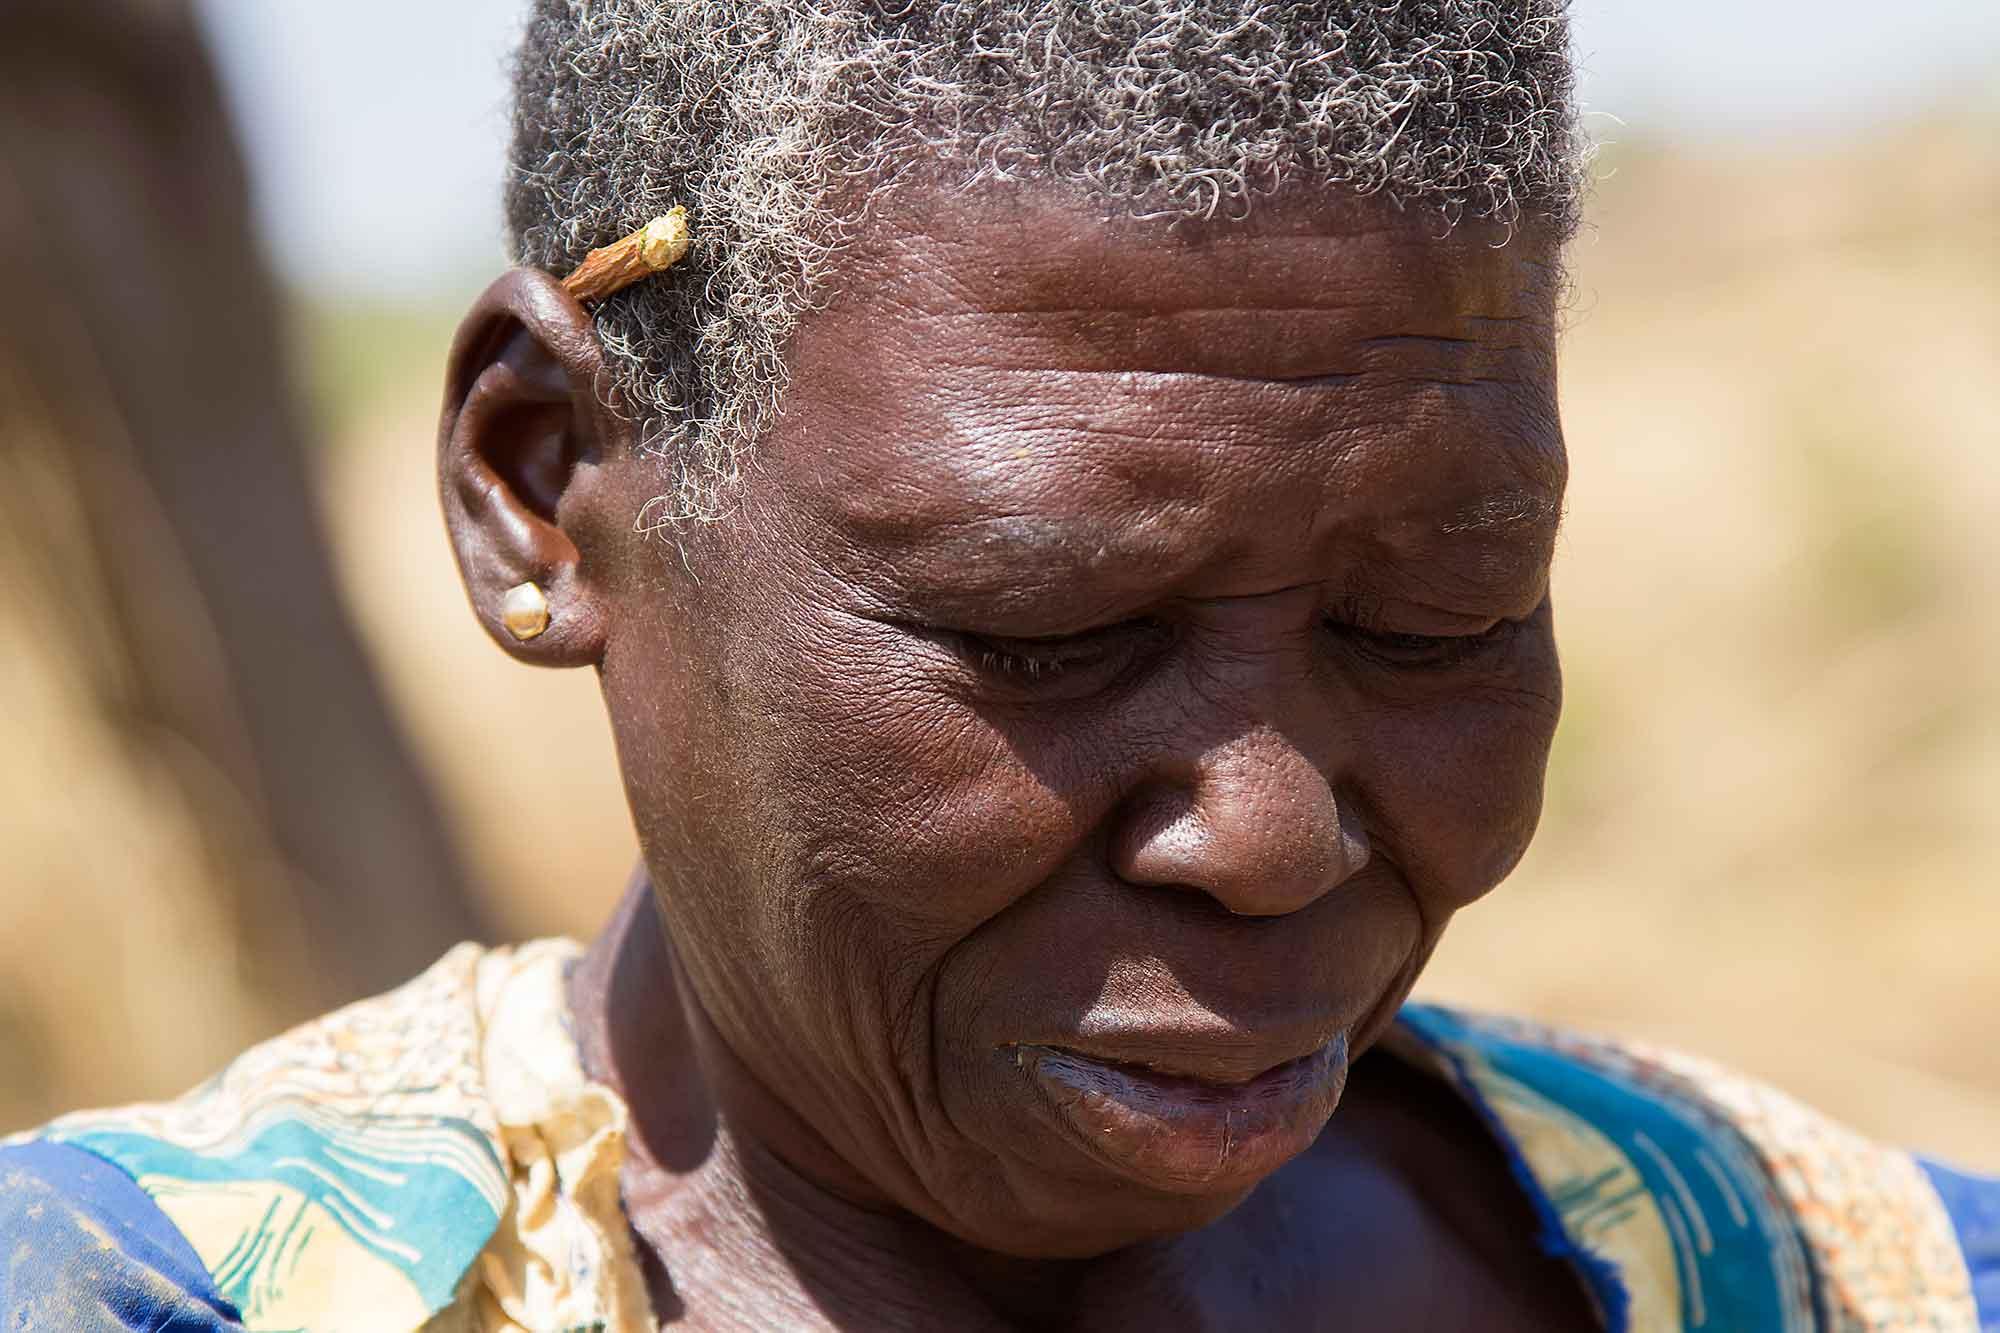 portrait-gold-worker-burkina-faso-africa